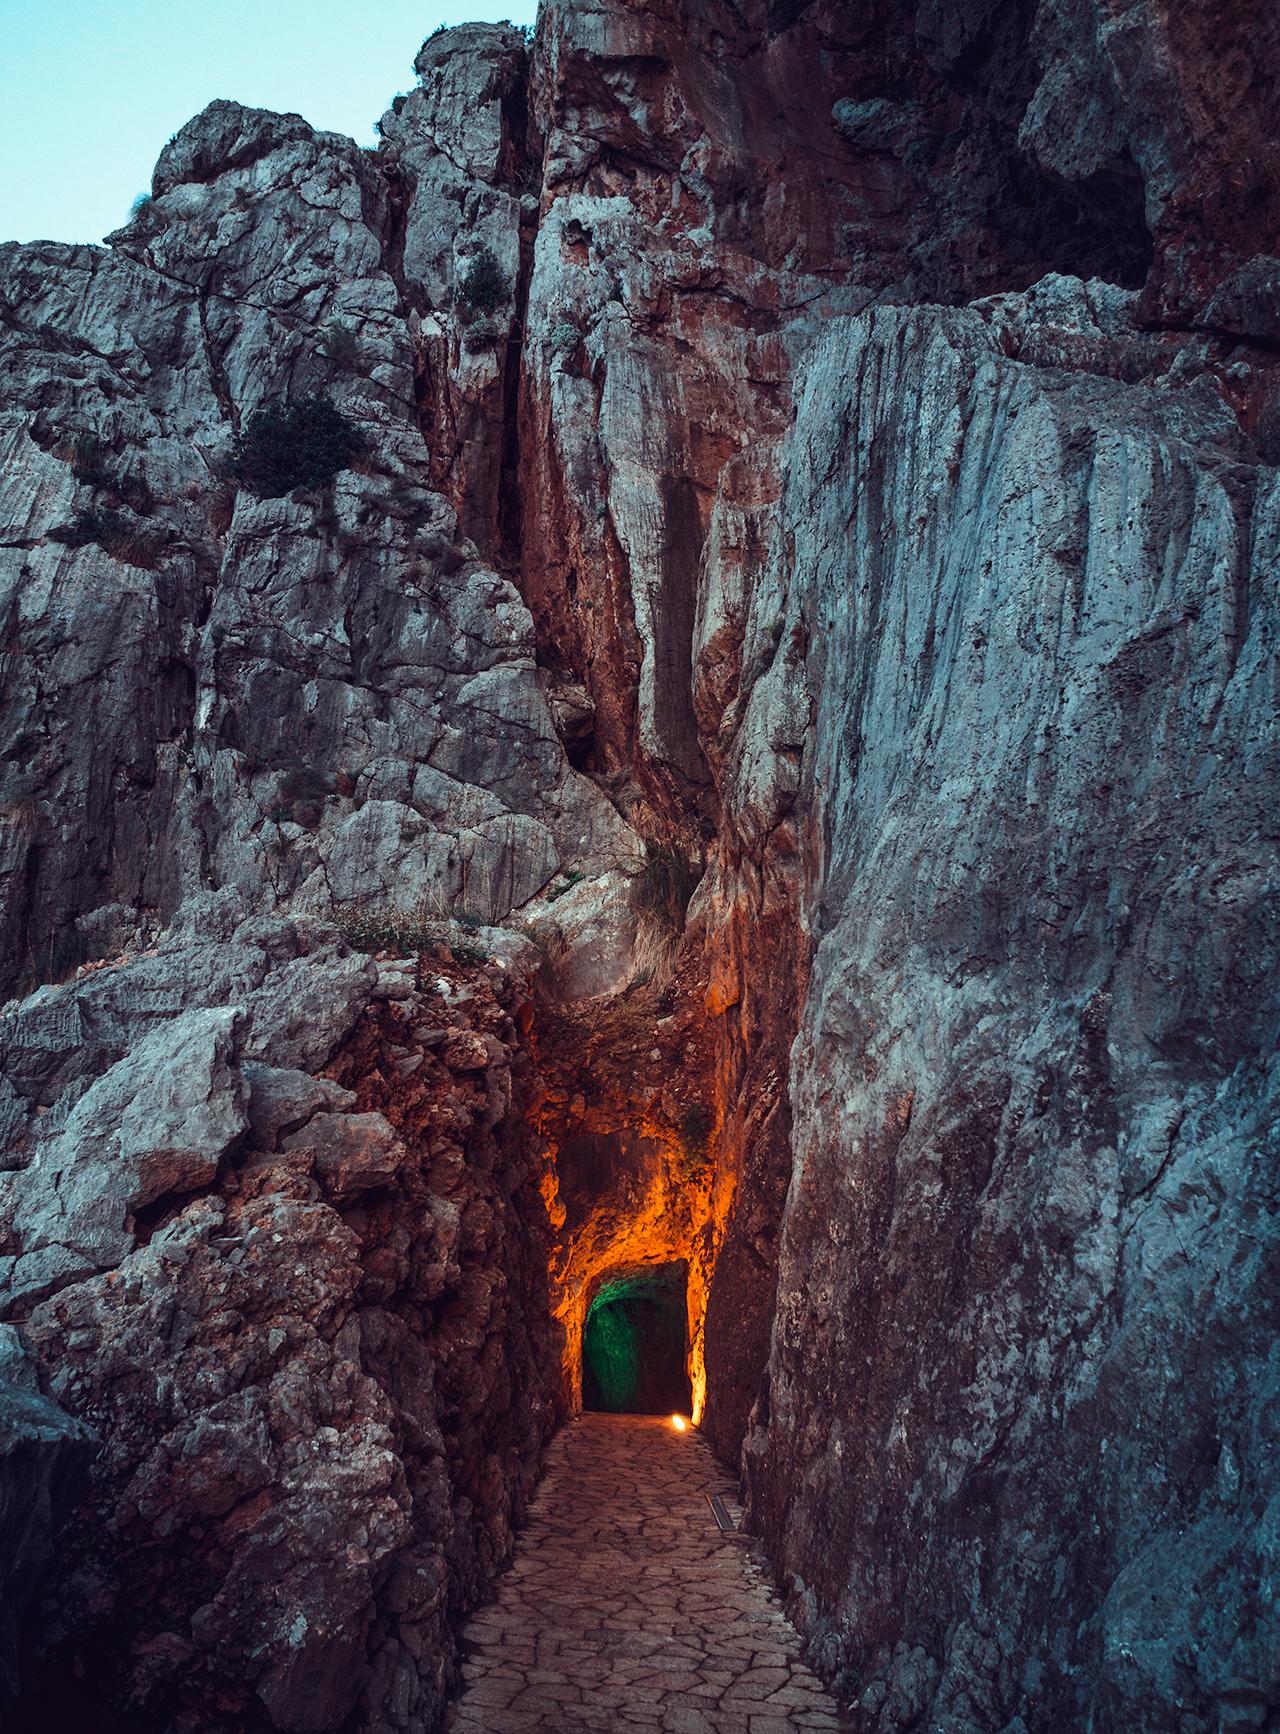 caveandlight